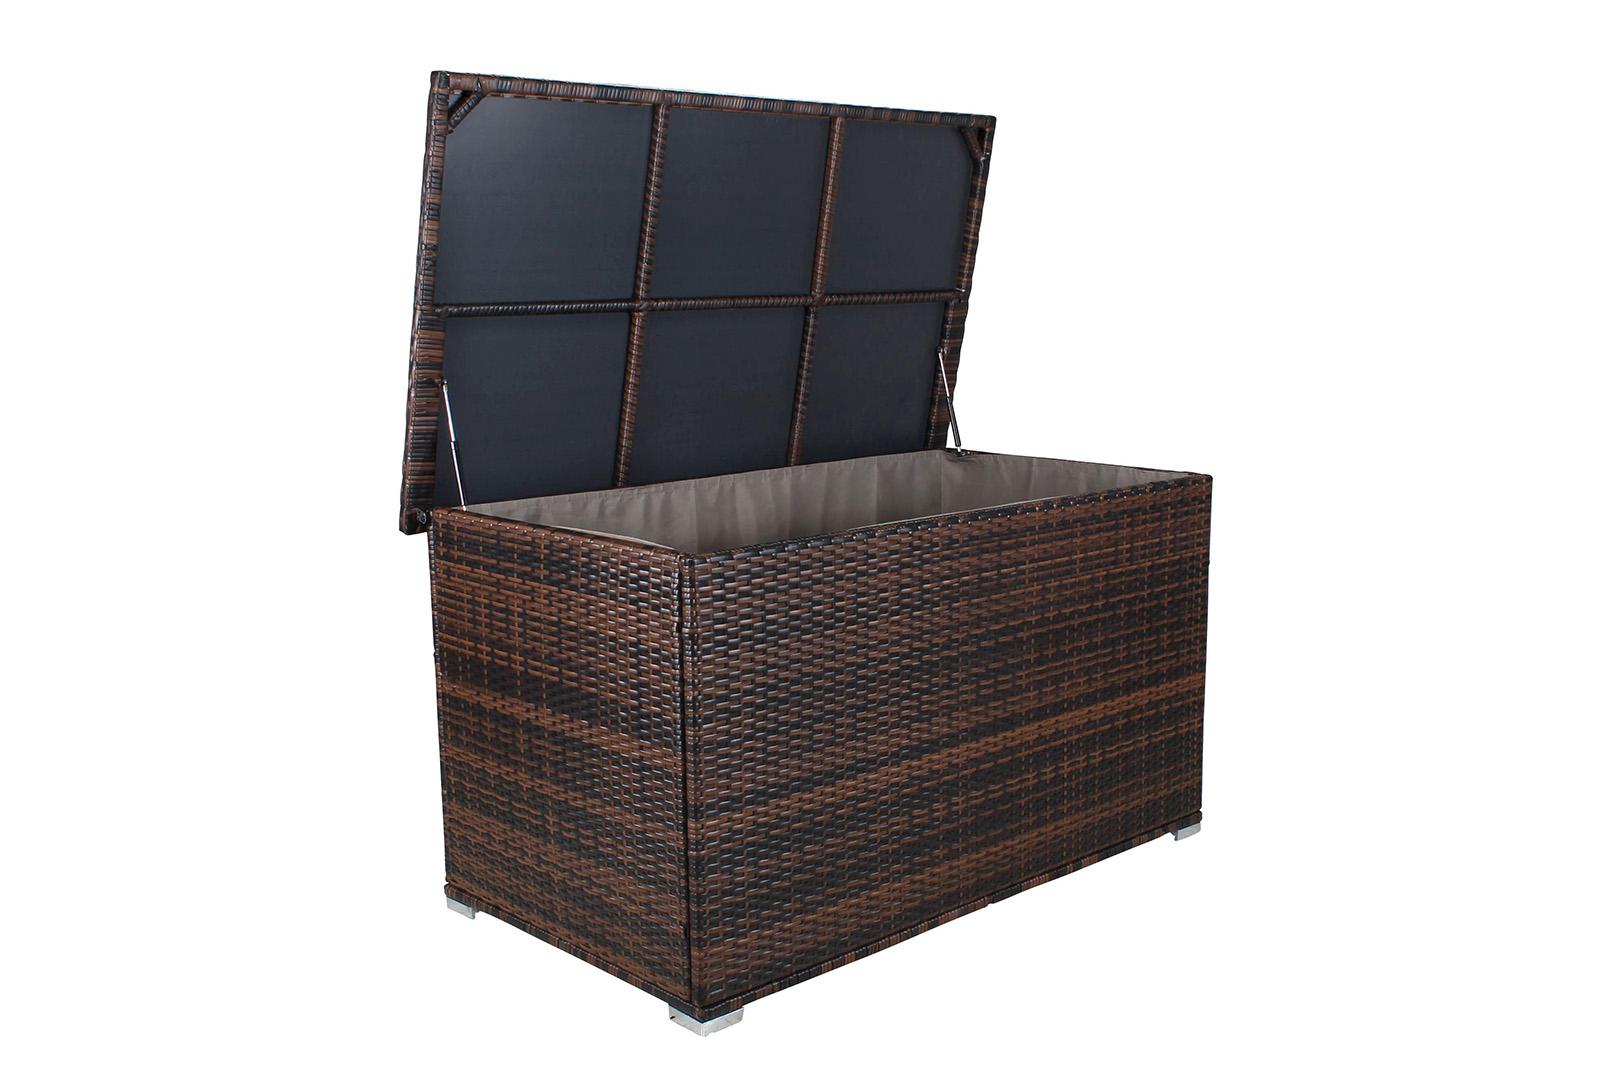 miweba xxl auflagenbox kissenbox 950l gartentruhe box polyrattan liege sitztruhe ebay. Black Bedroom Furniture Sets. Home Design Ideas